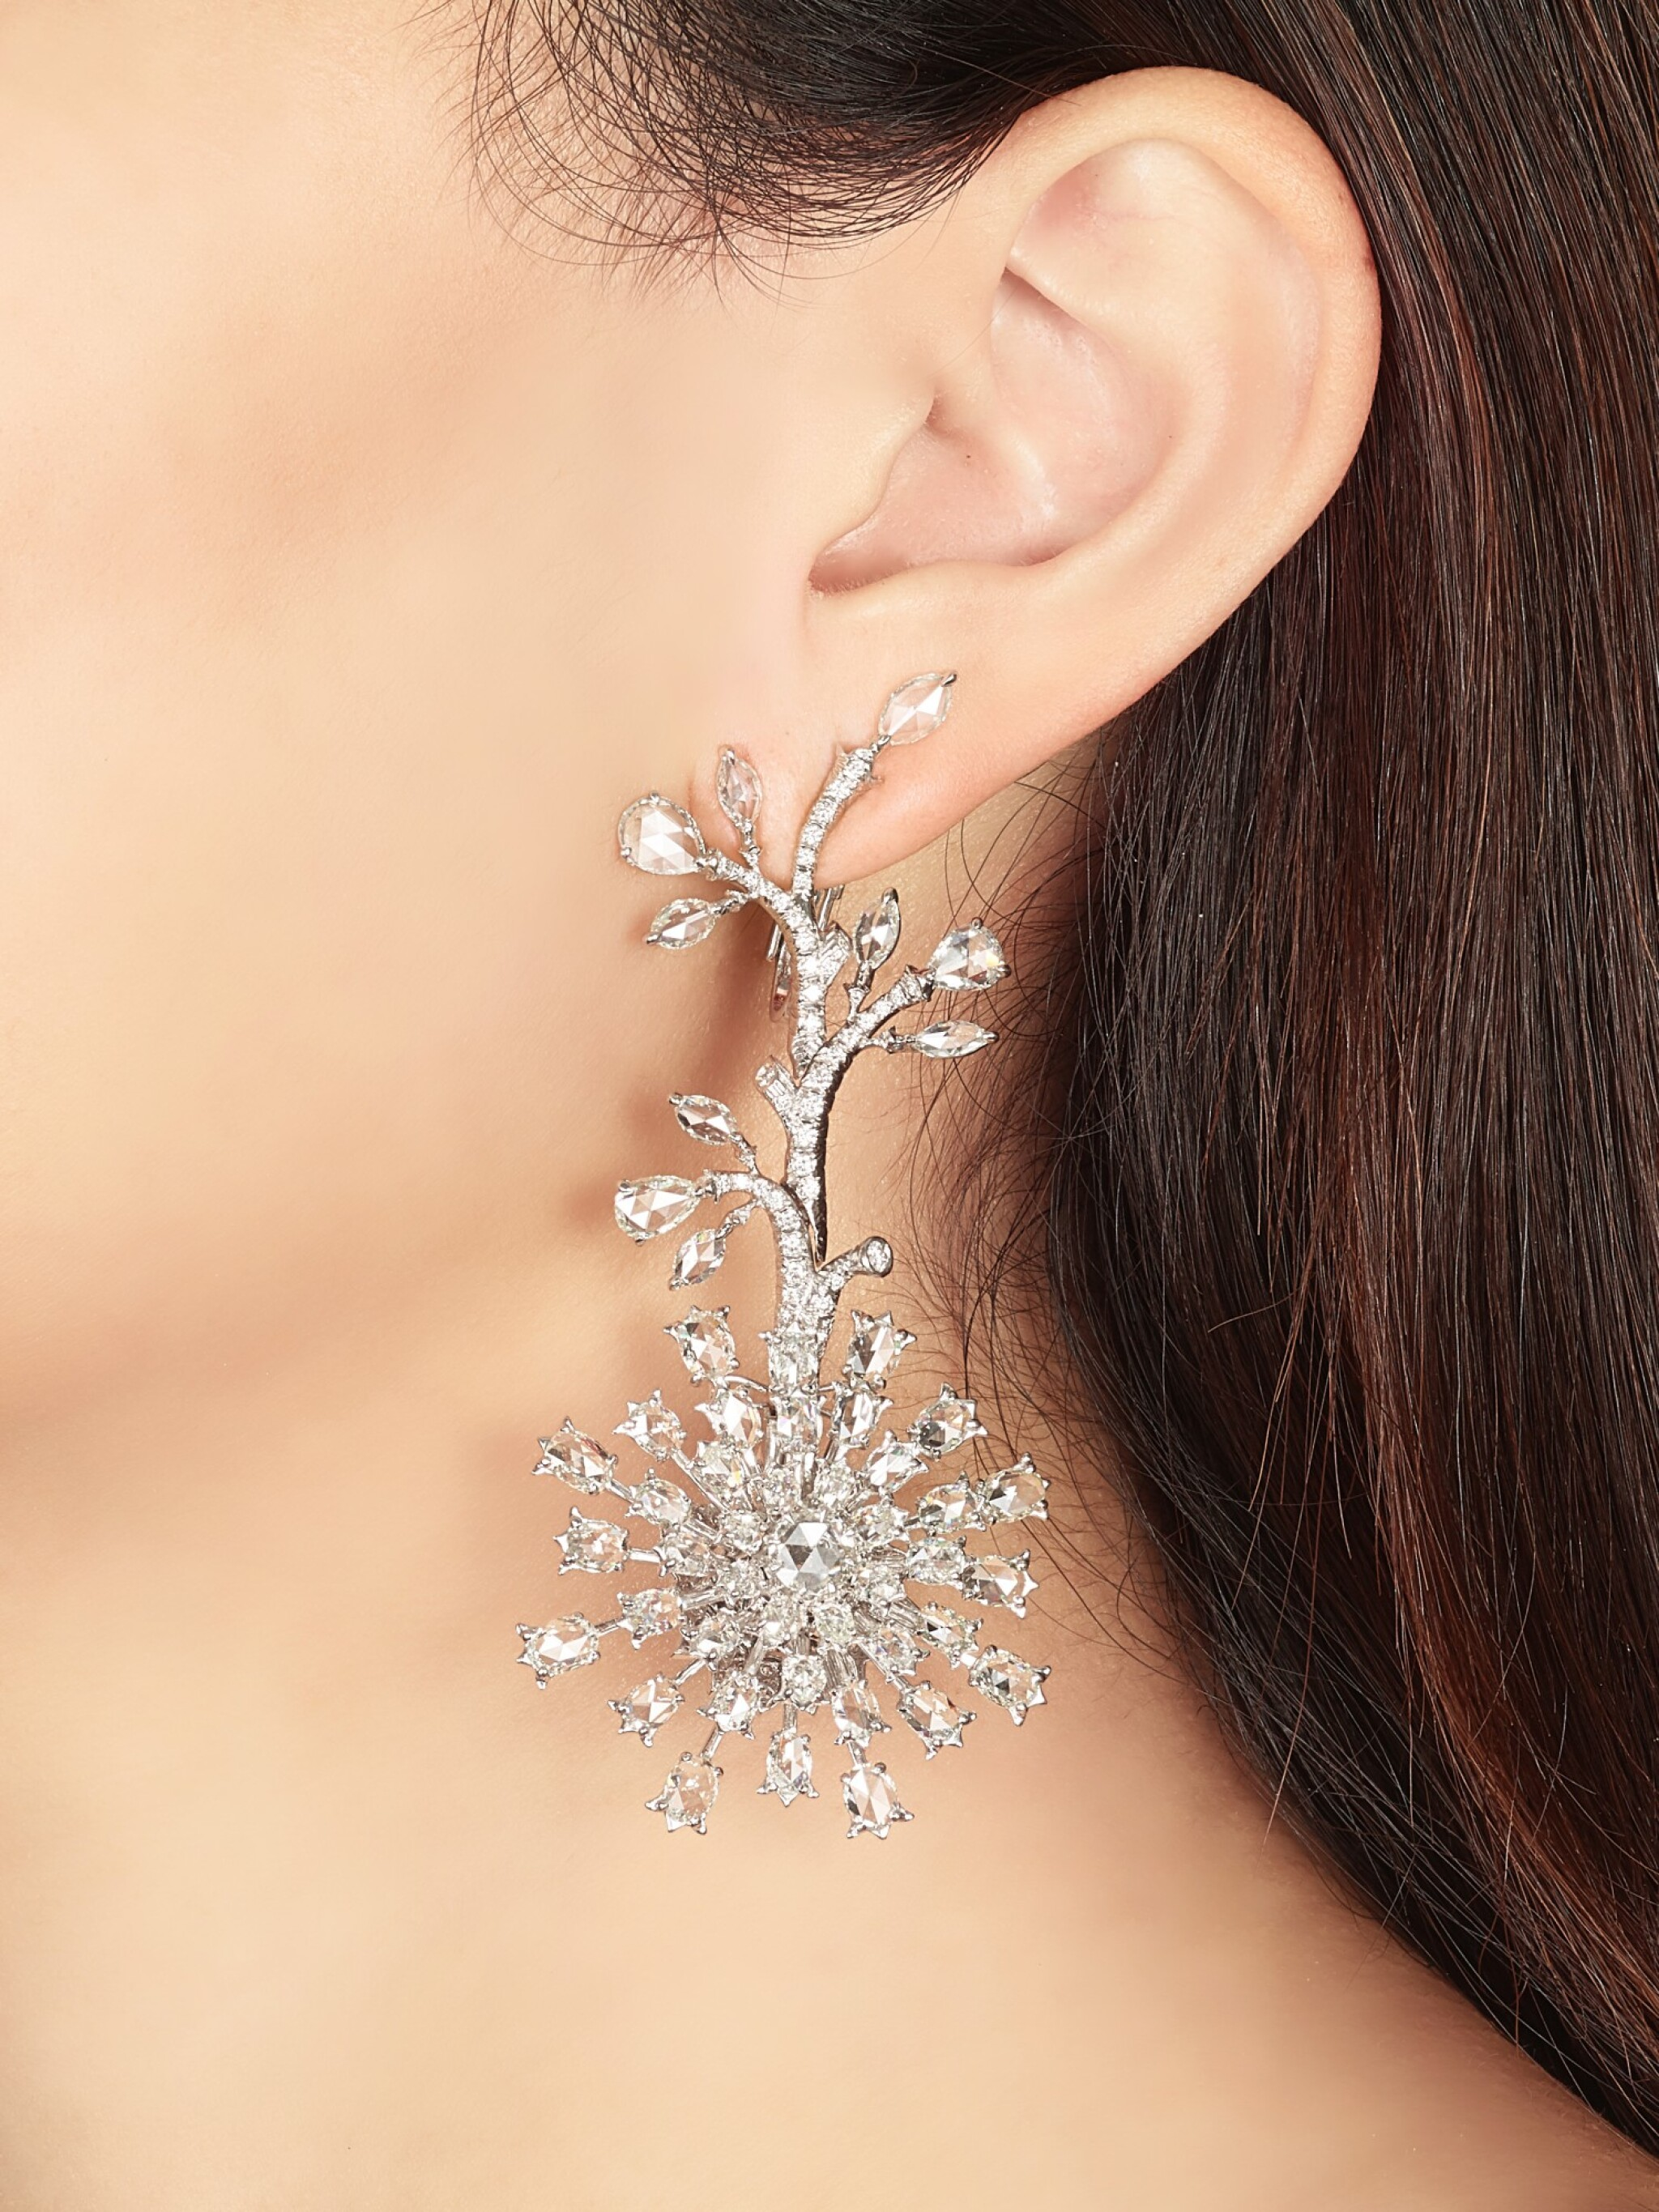 View full screen - View 1 of Lot 1416. VAK | 'CHRYSANTHEMUMS IN SUMMER' PAIR OF DIAMOND PENDENT EARRINGS |  VAK | 'Chrysanthemums in Summer' 鑽石吊耳環一對.